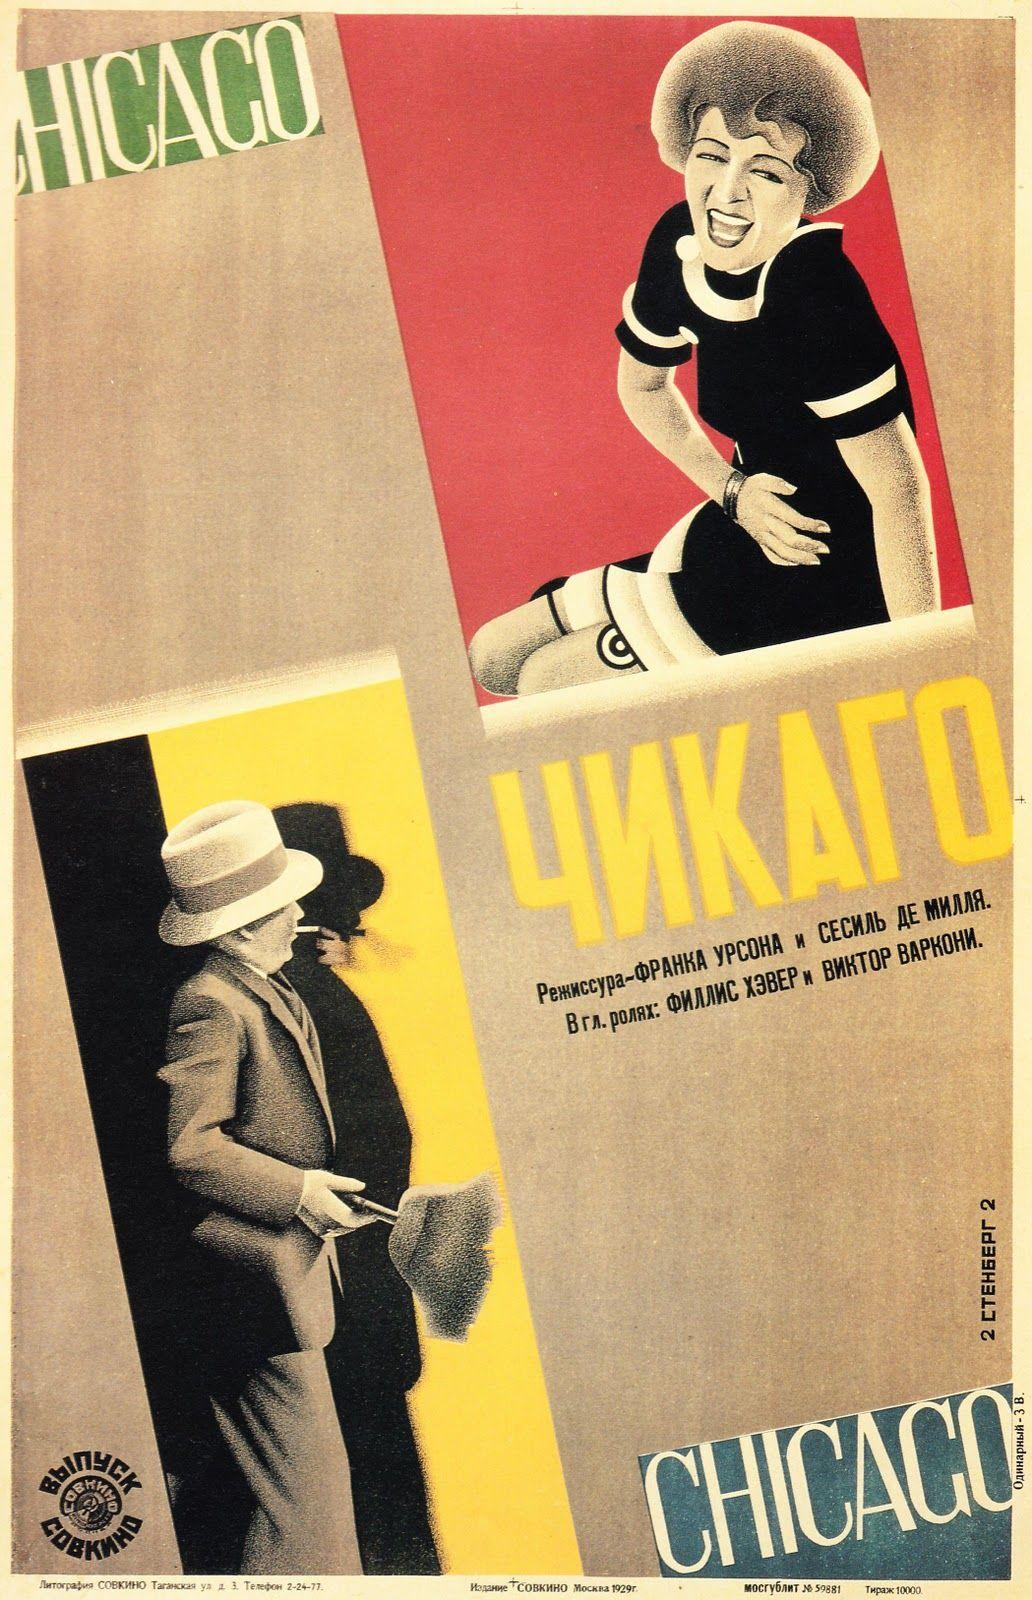 Poster design 1920s - Russian Poster Design By Vladimir And Georgii Stenberg